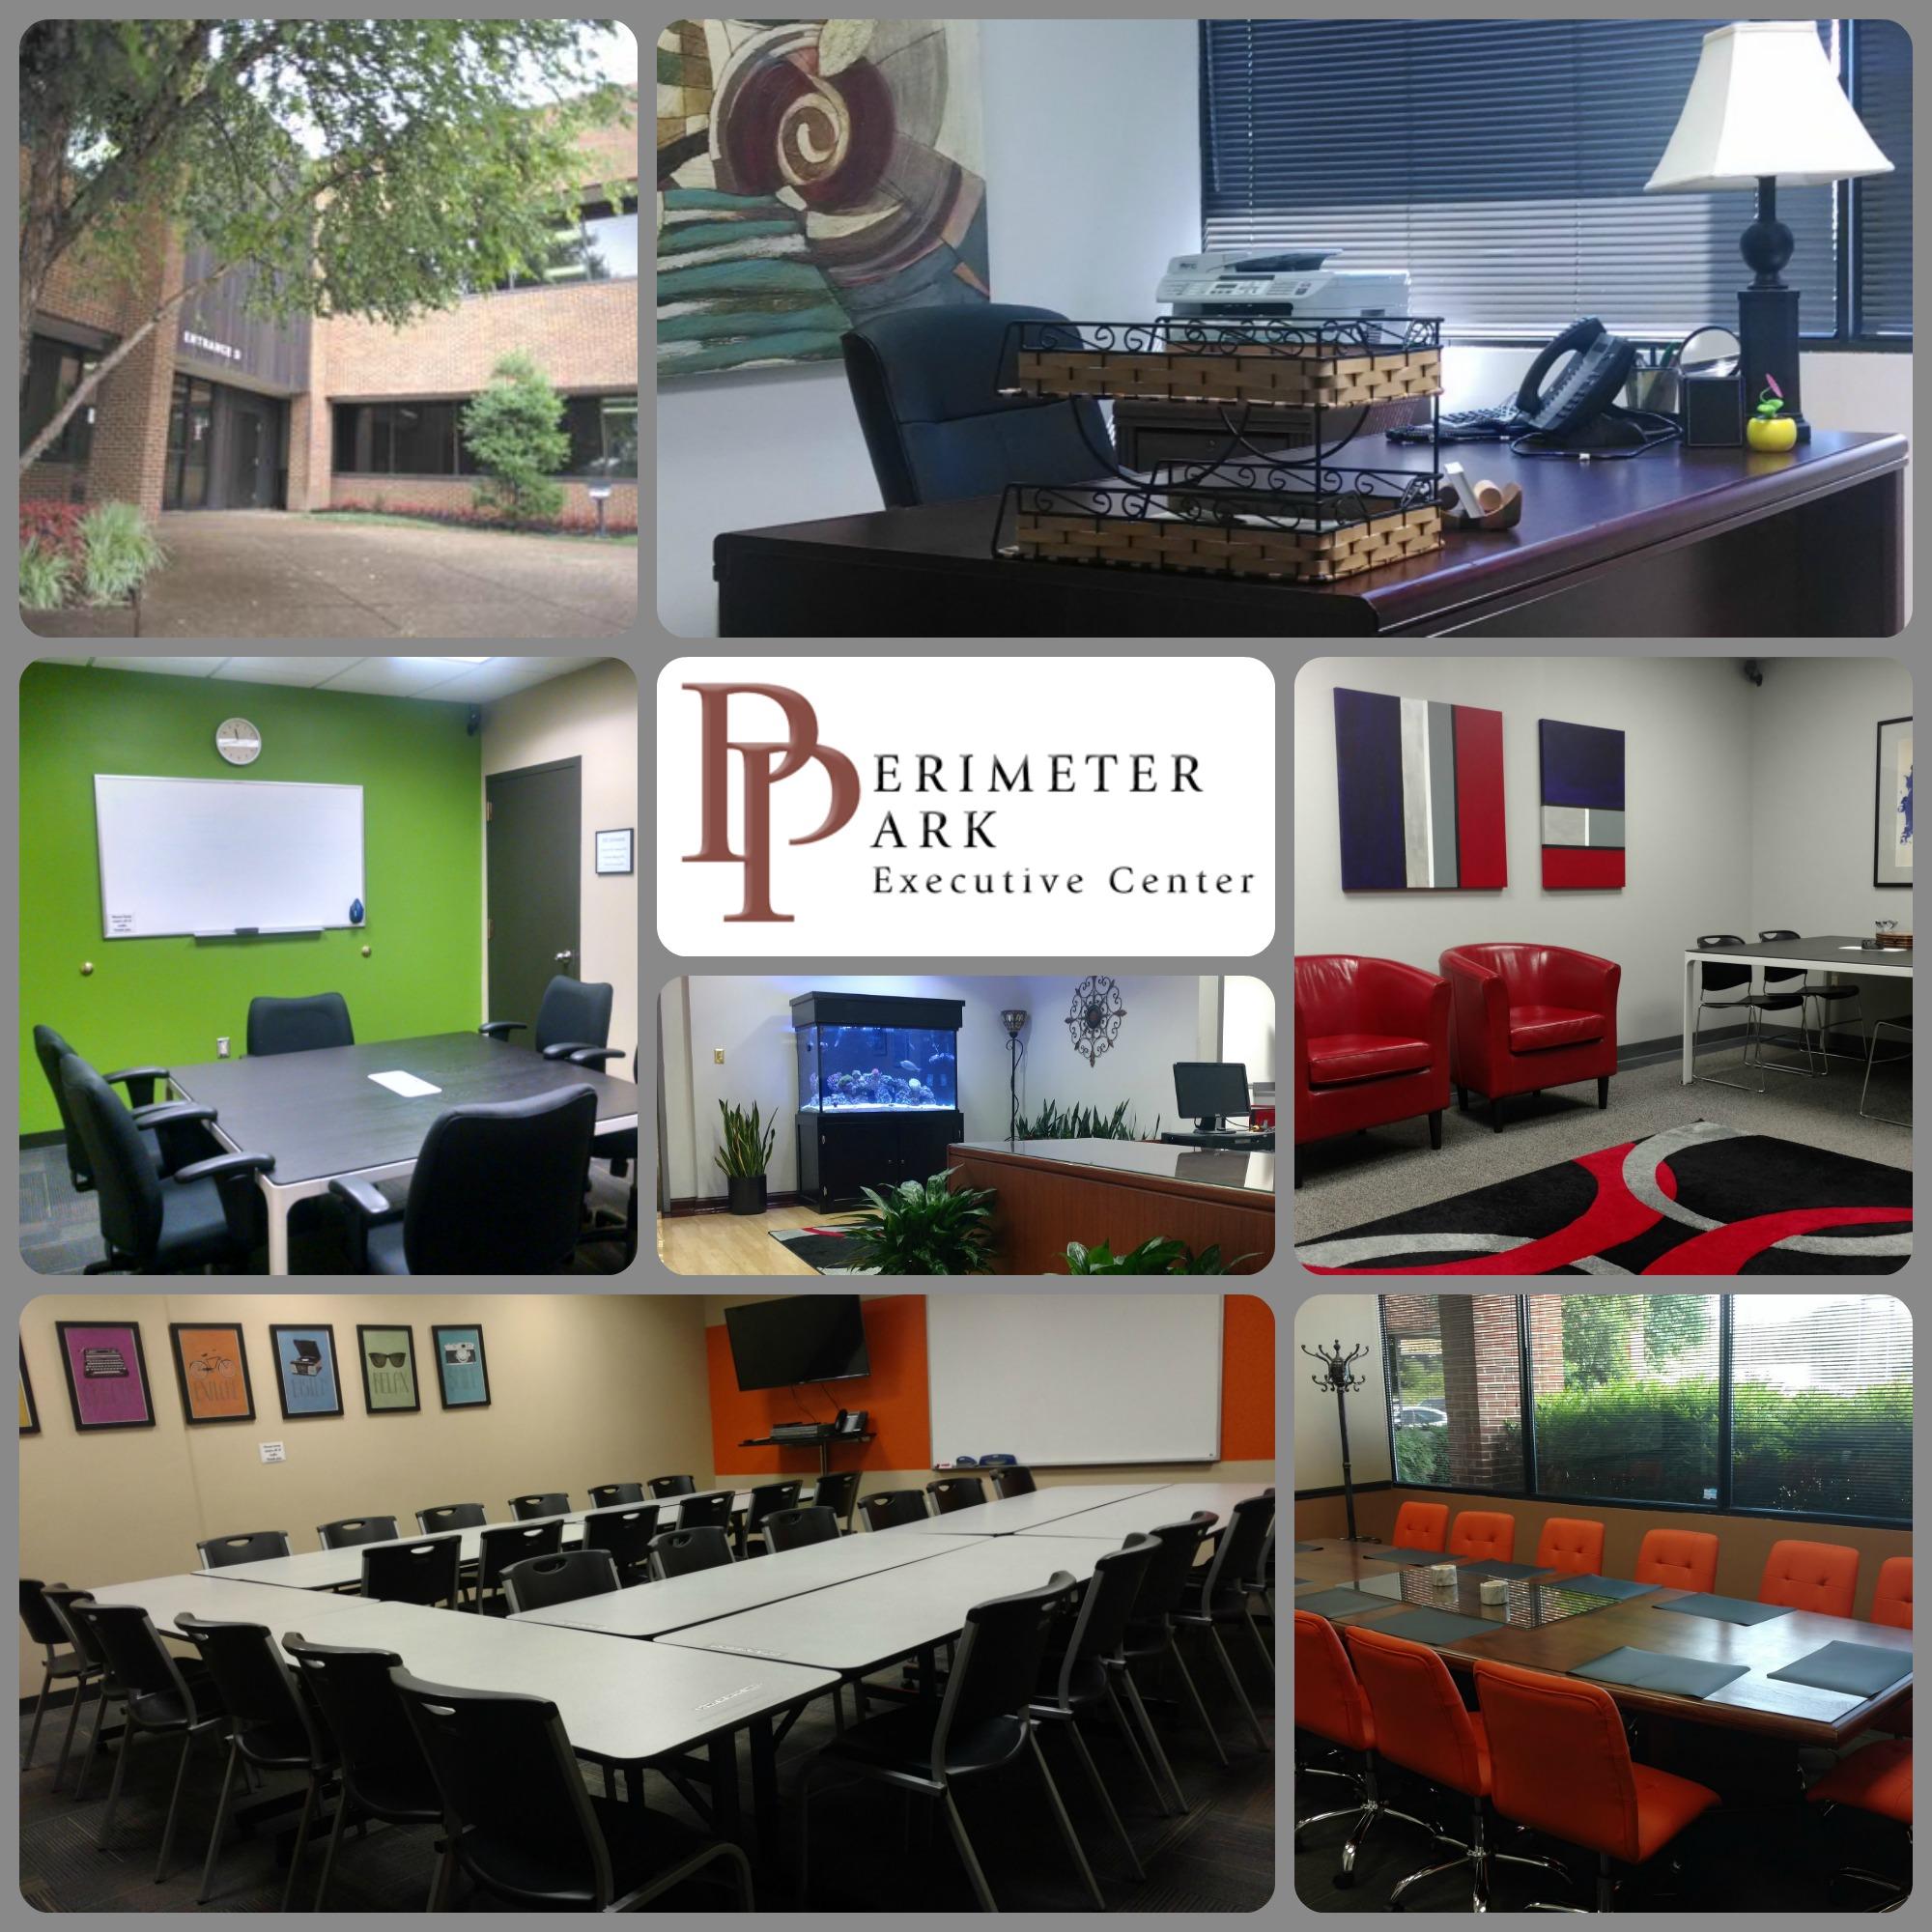 Perimeter Park Executive Center   Flexible Offices @ Perimeter Park |  615.781.4200